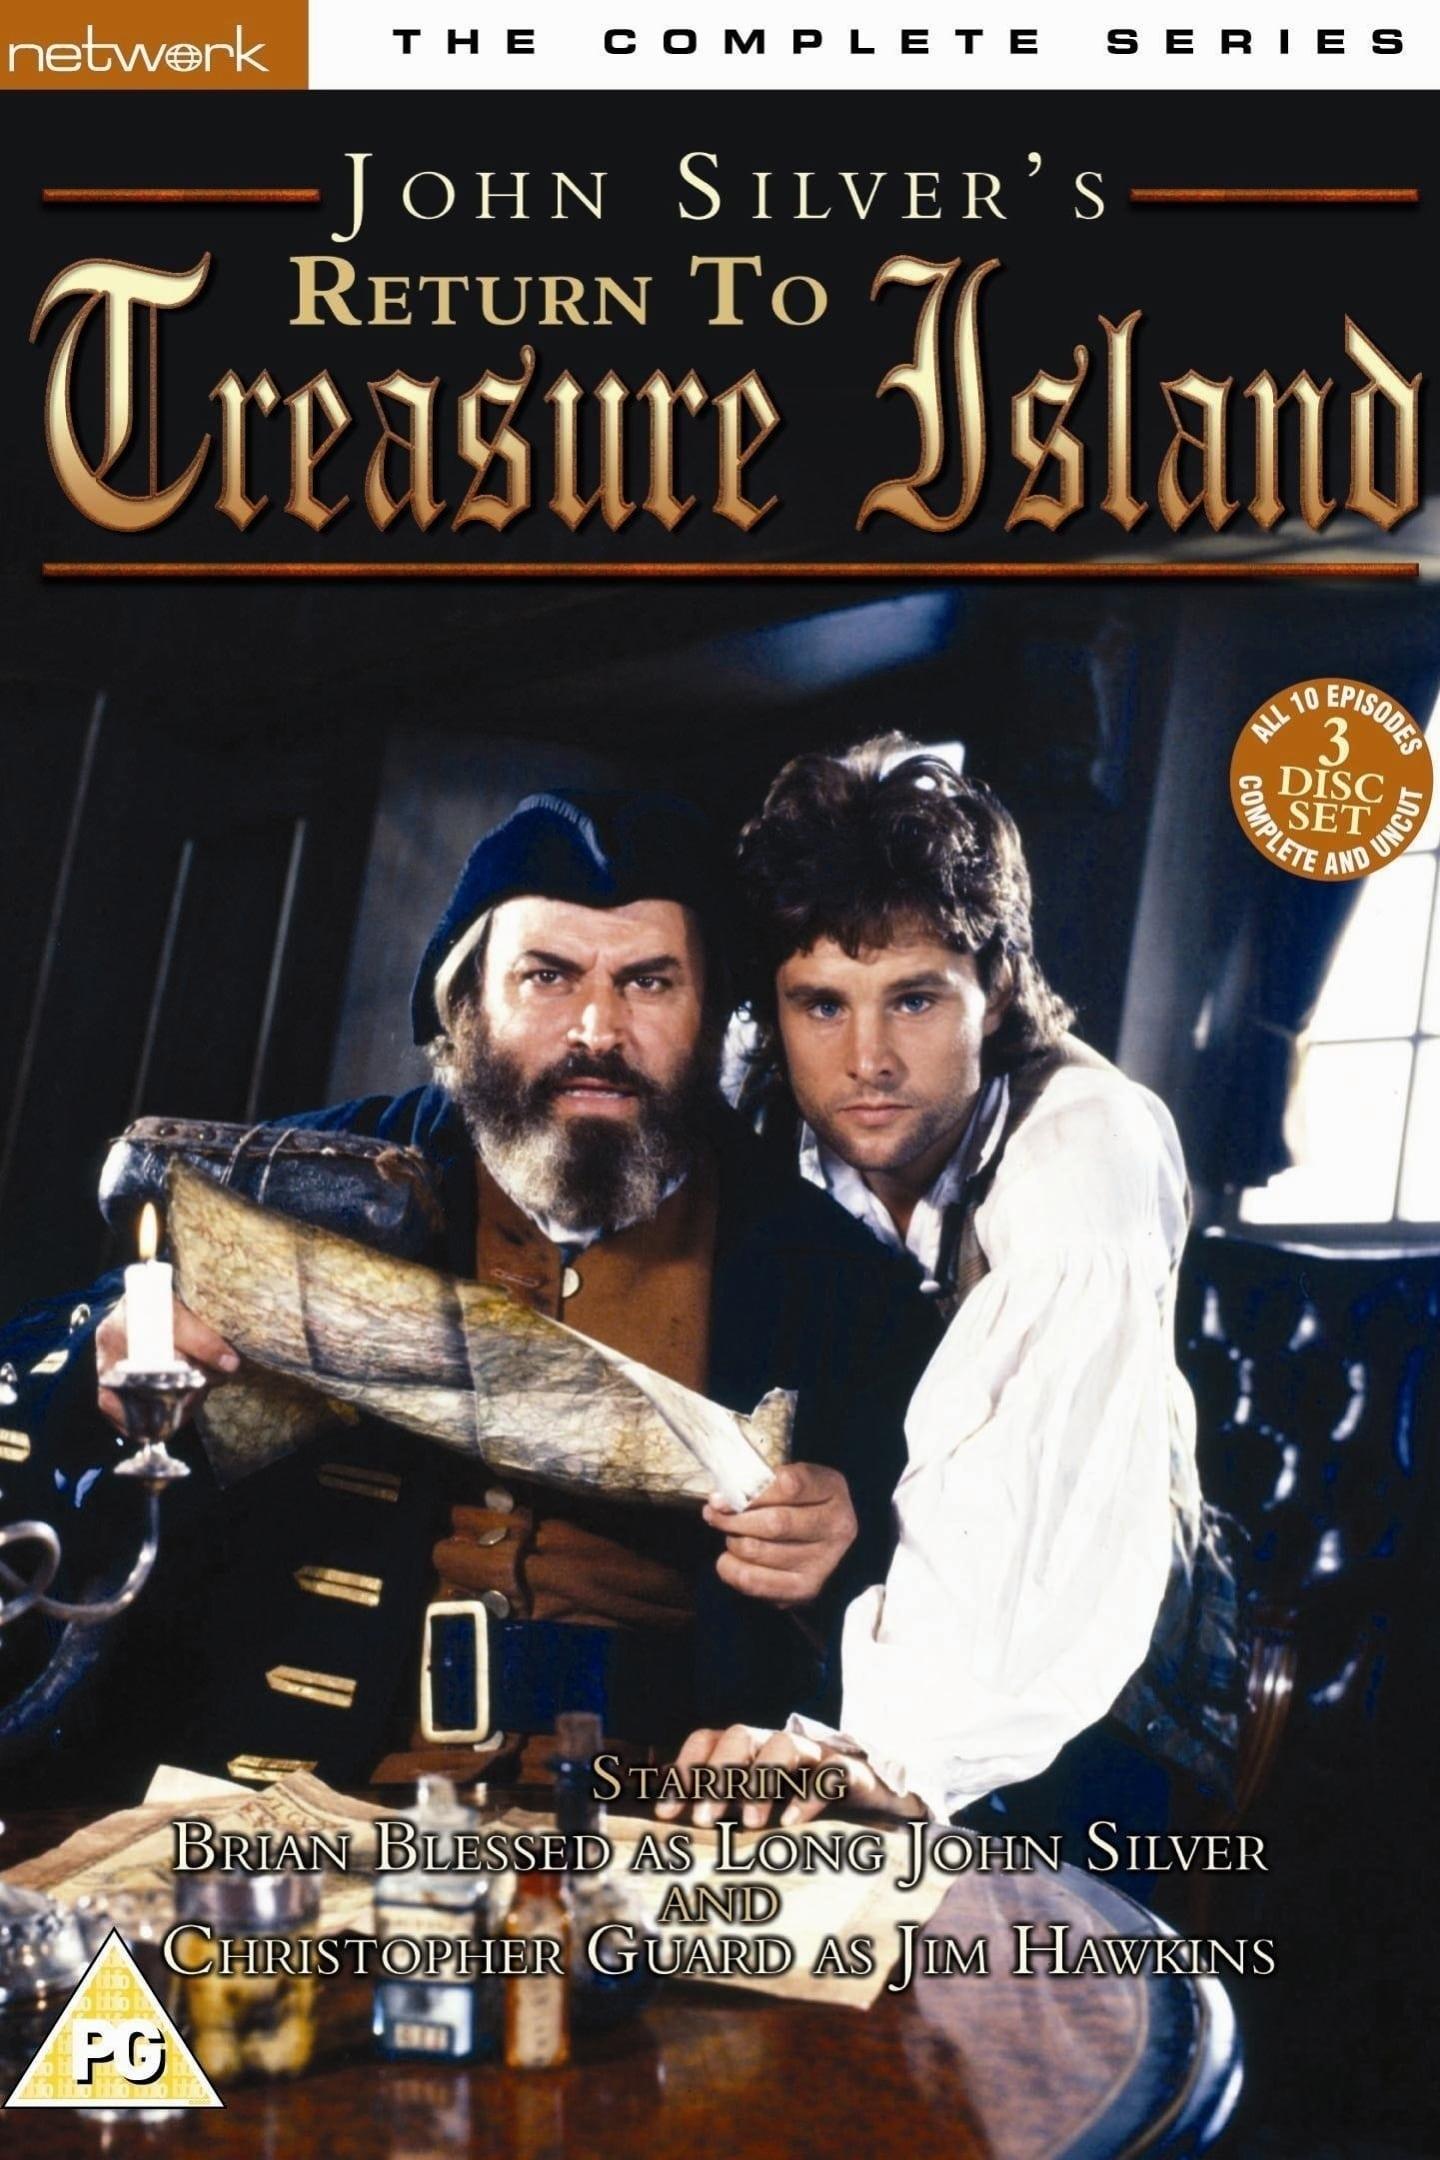 John Silver's Return to Treasure Island